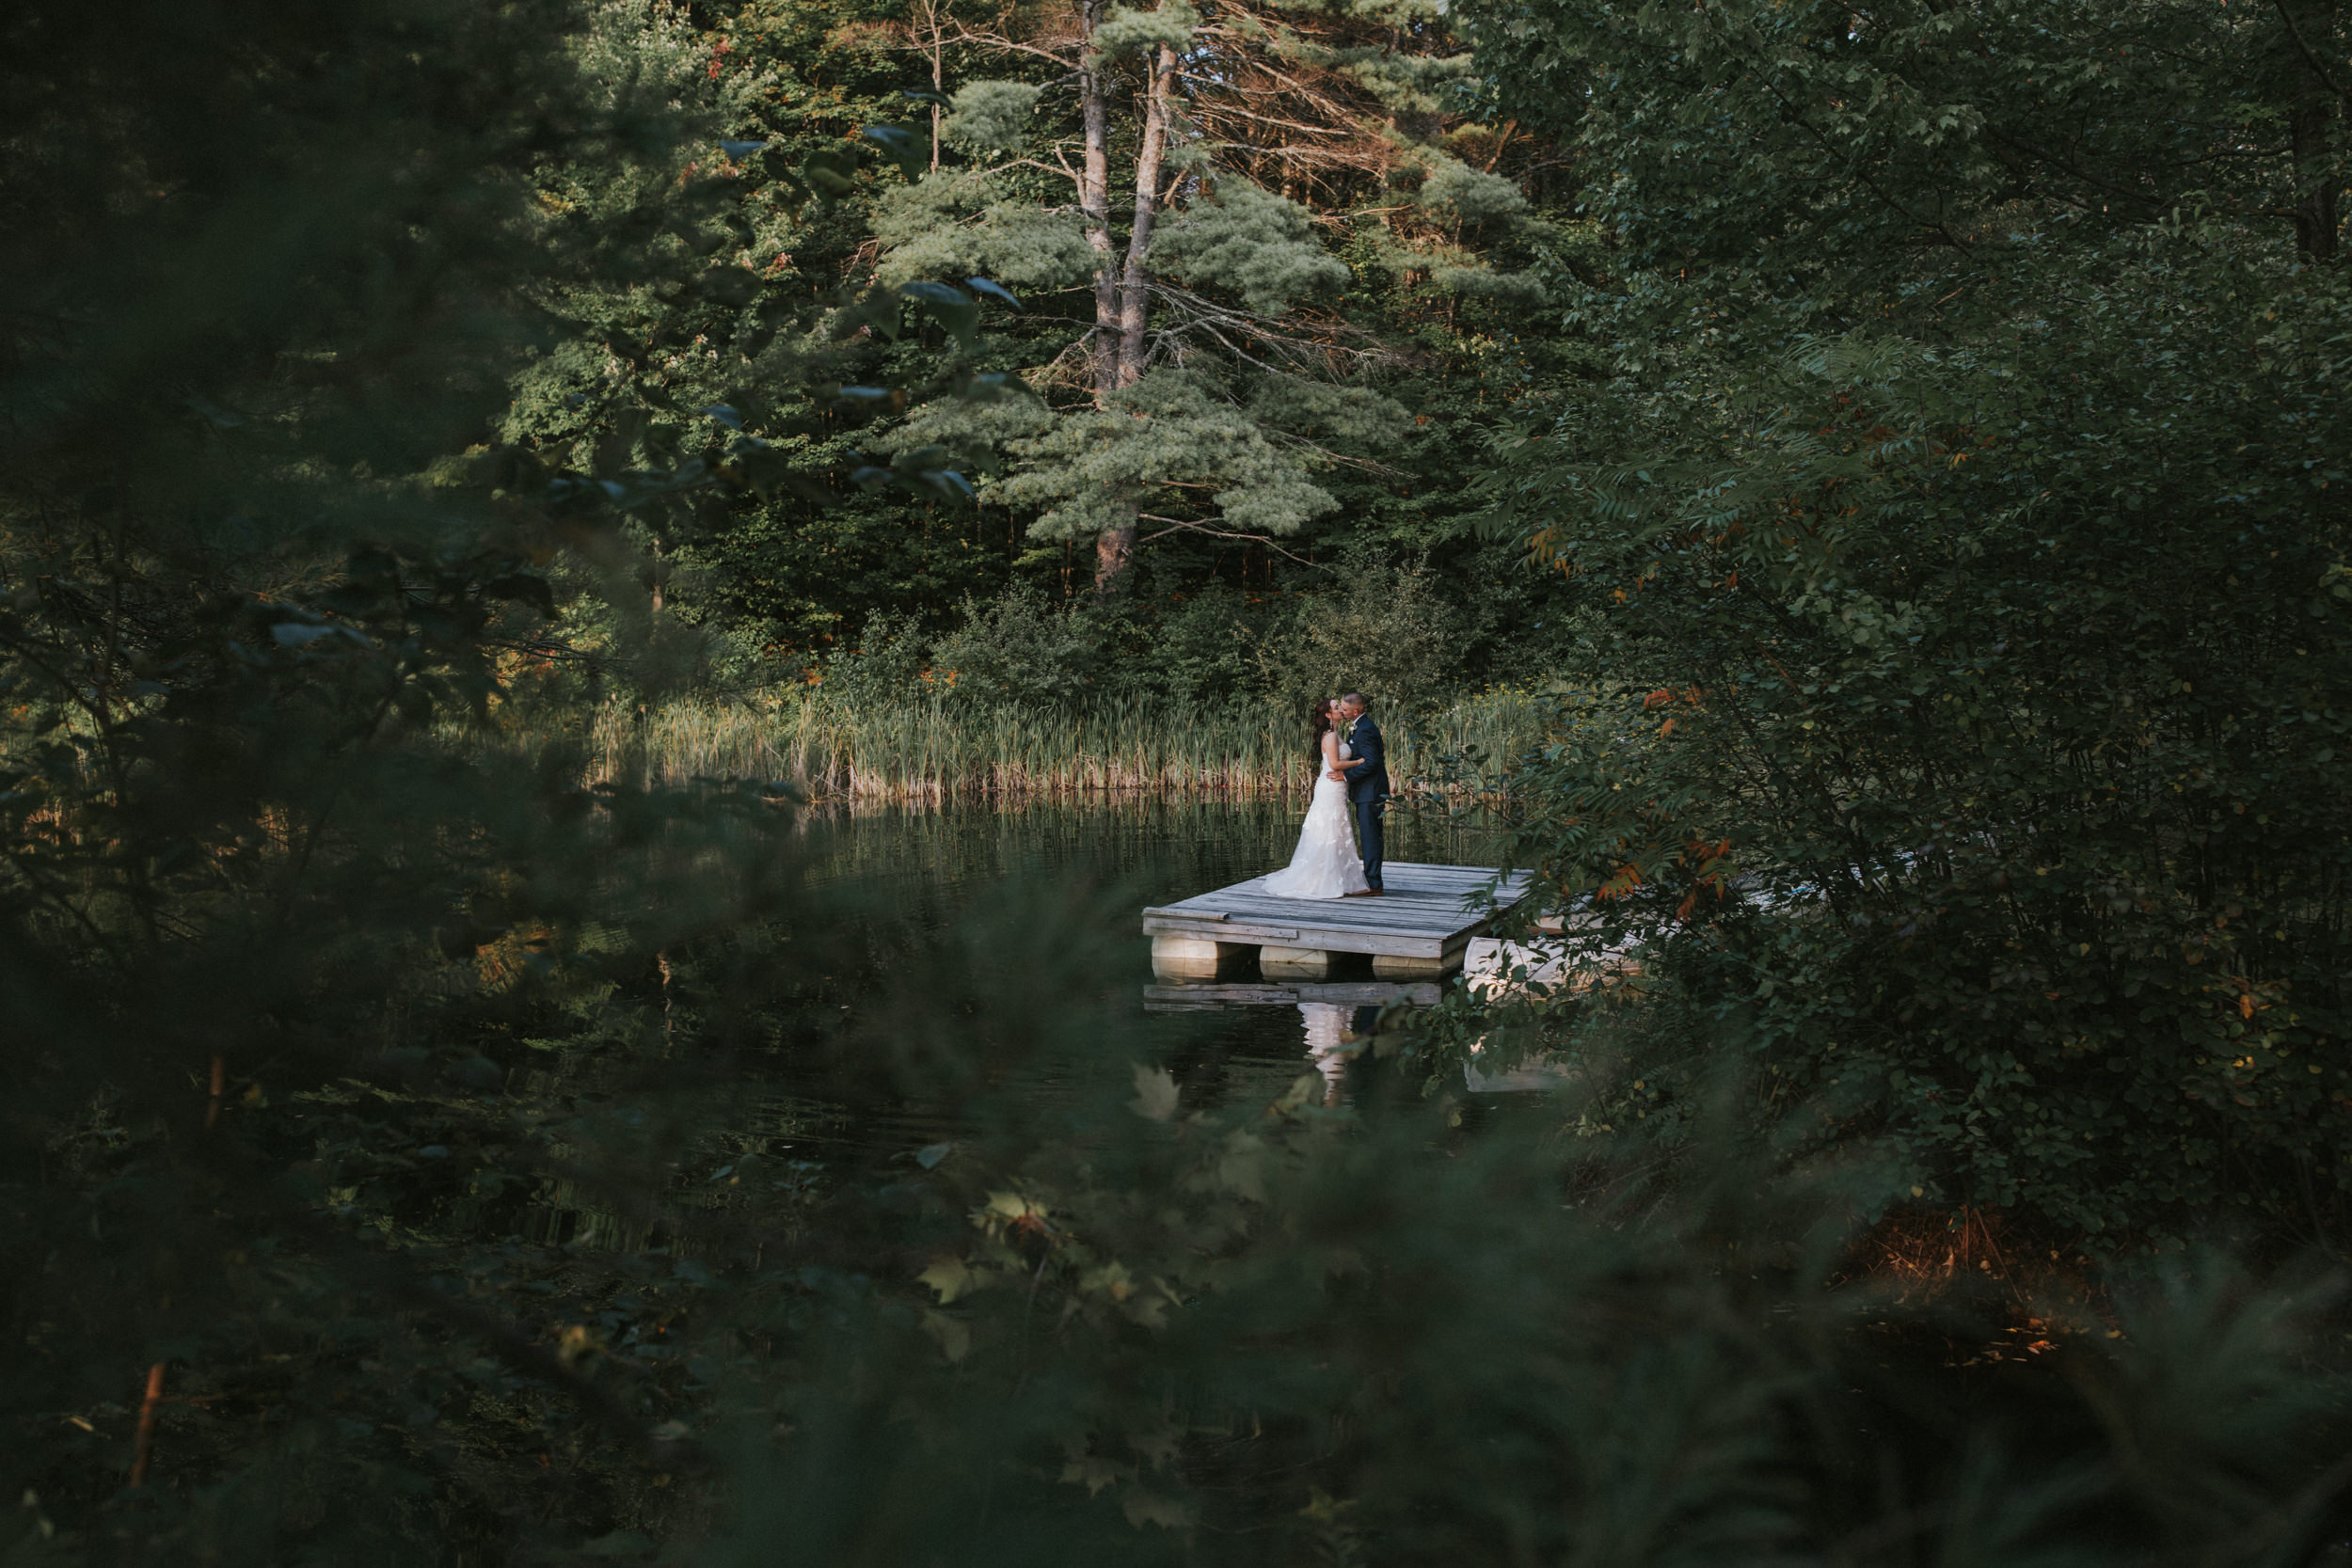 New Hampshire moody wedding photography